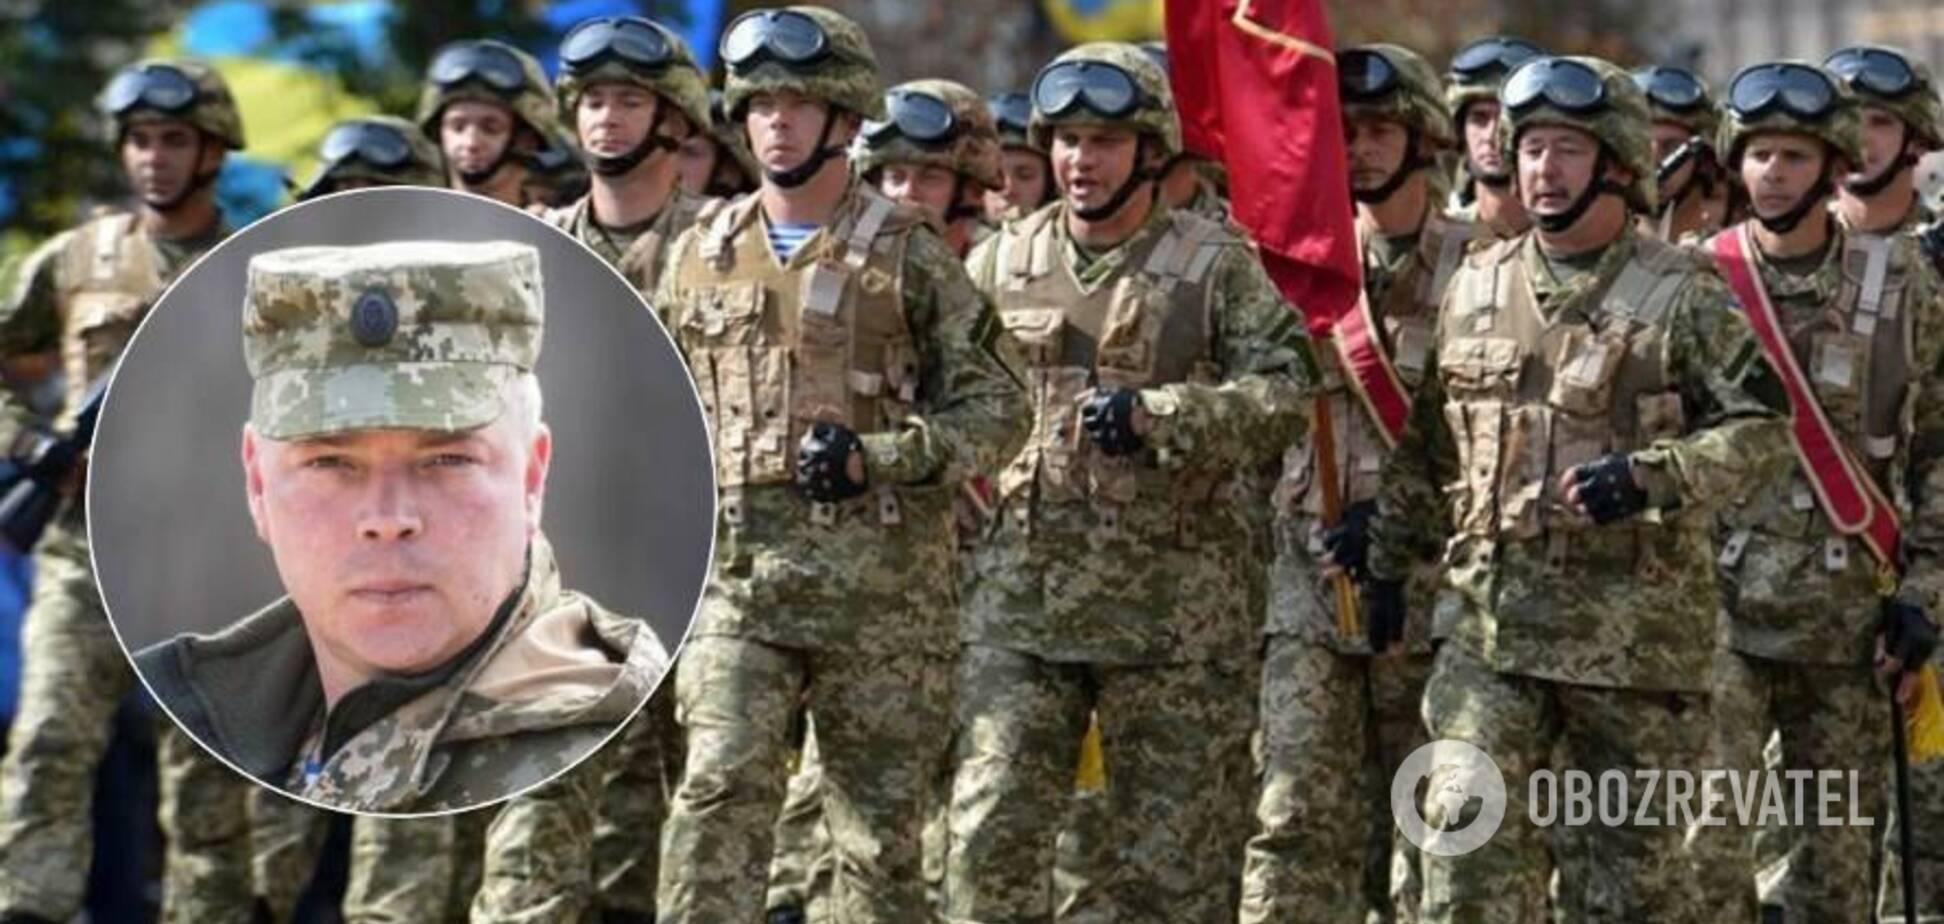 Генерал Забродський: комусь в Україні дуже хочеться, аби армія запам'яталась не героїзмом, а карними справами